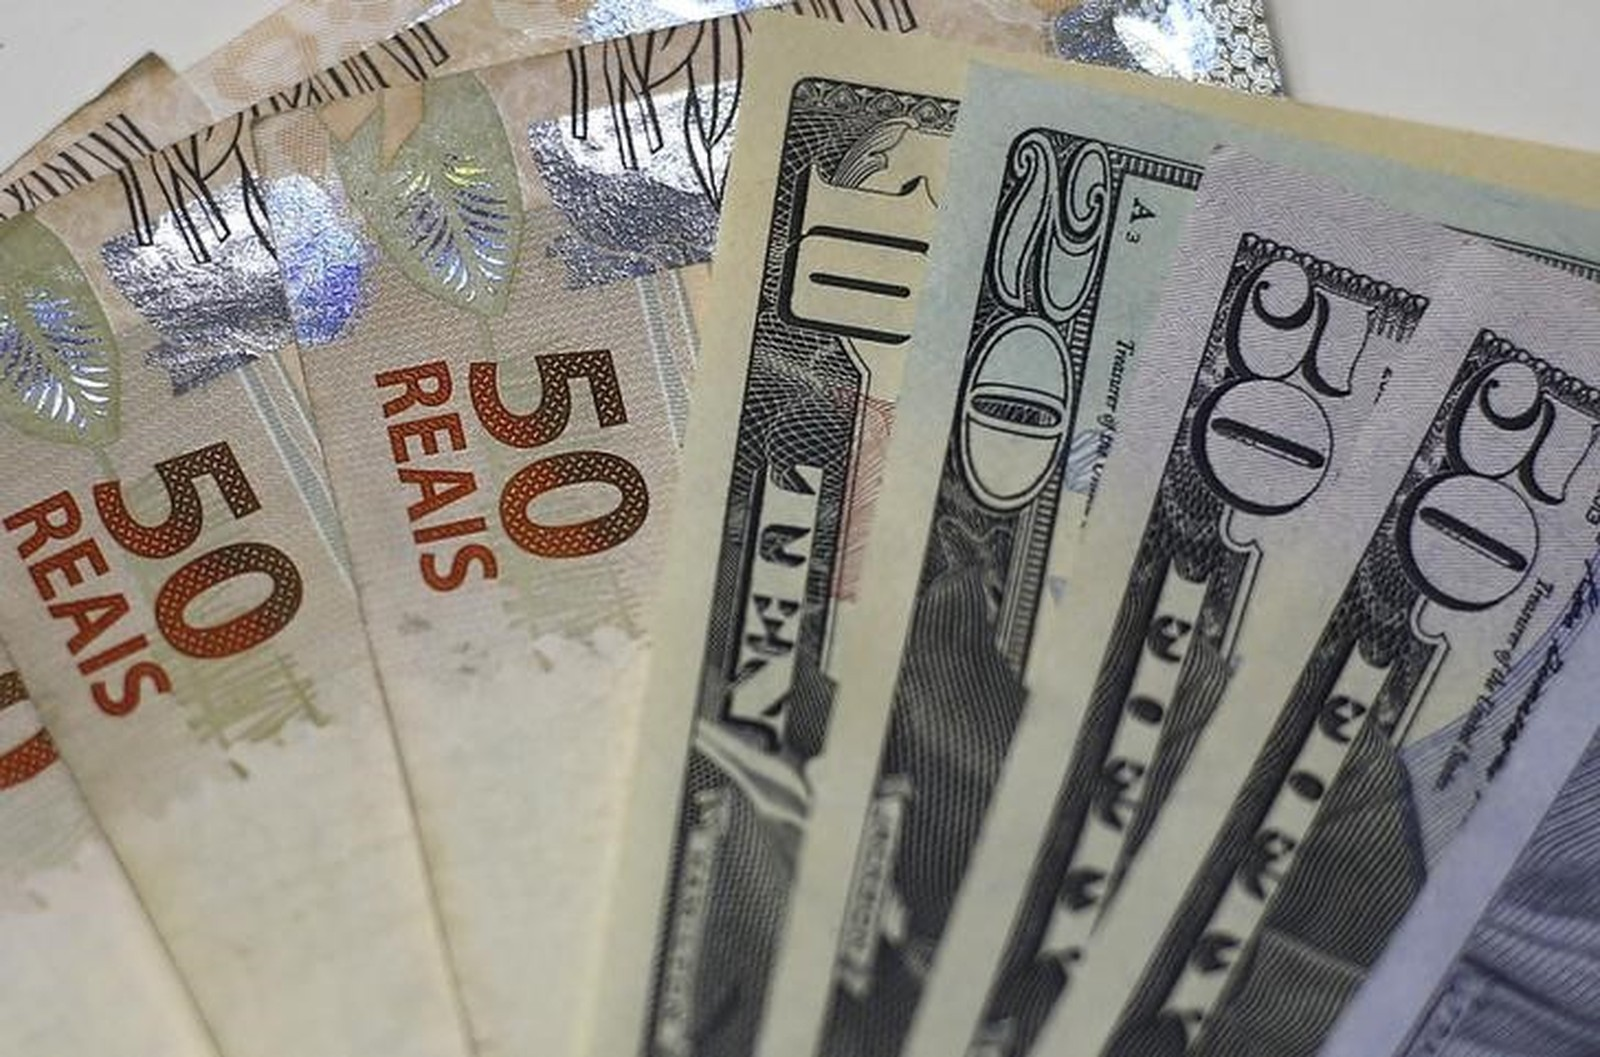 Dólar passa a subir, negociado acima de R$ 3,75 - Noticias